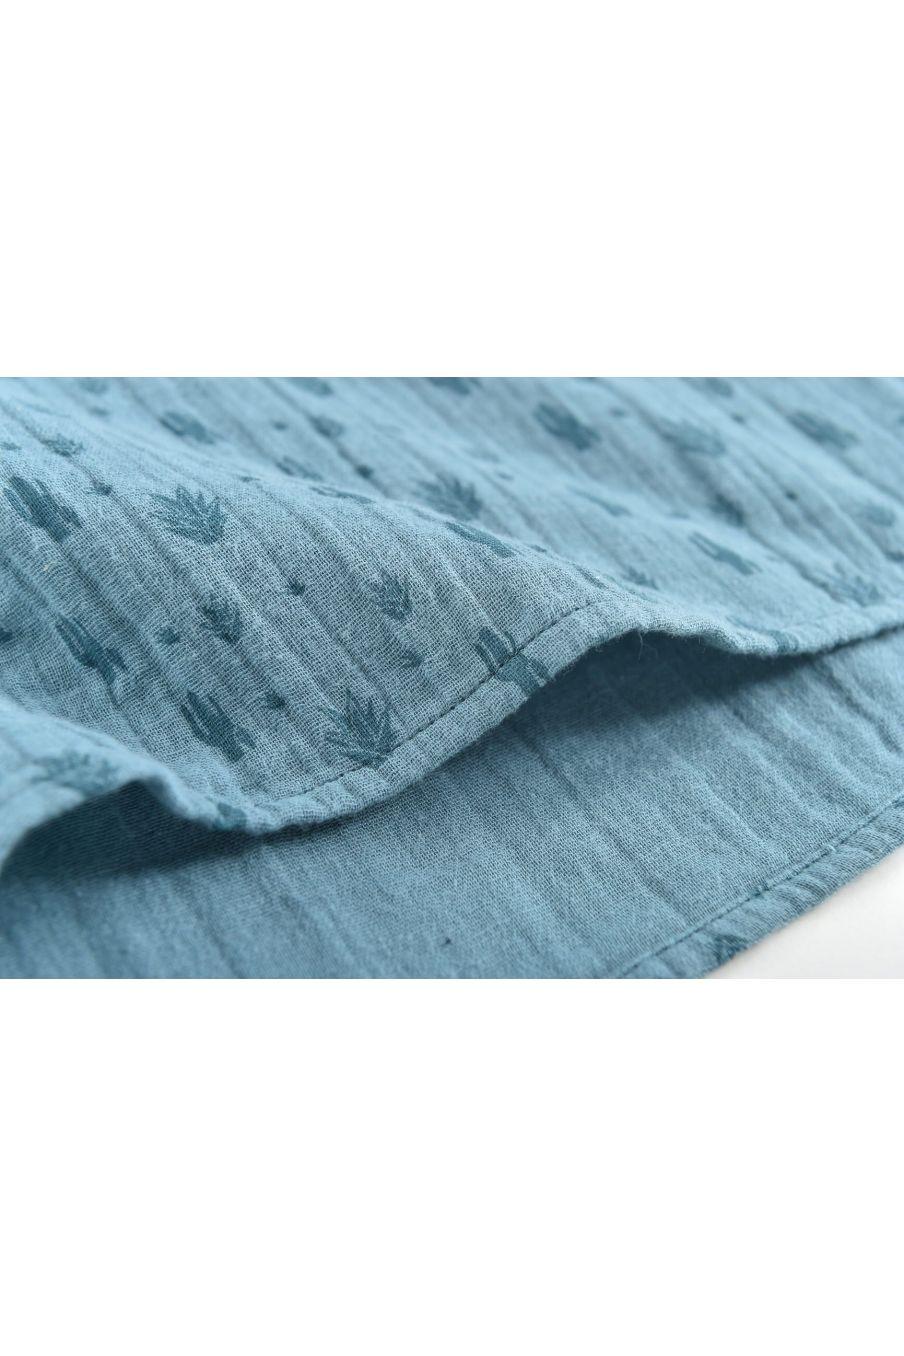 boheme chic vintage chemise garcon amano storm cactus